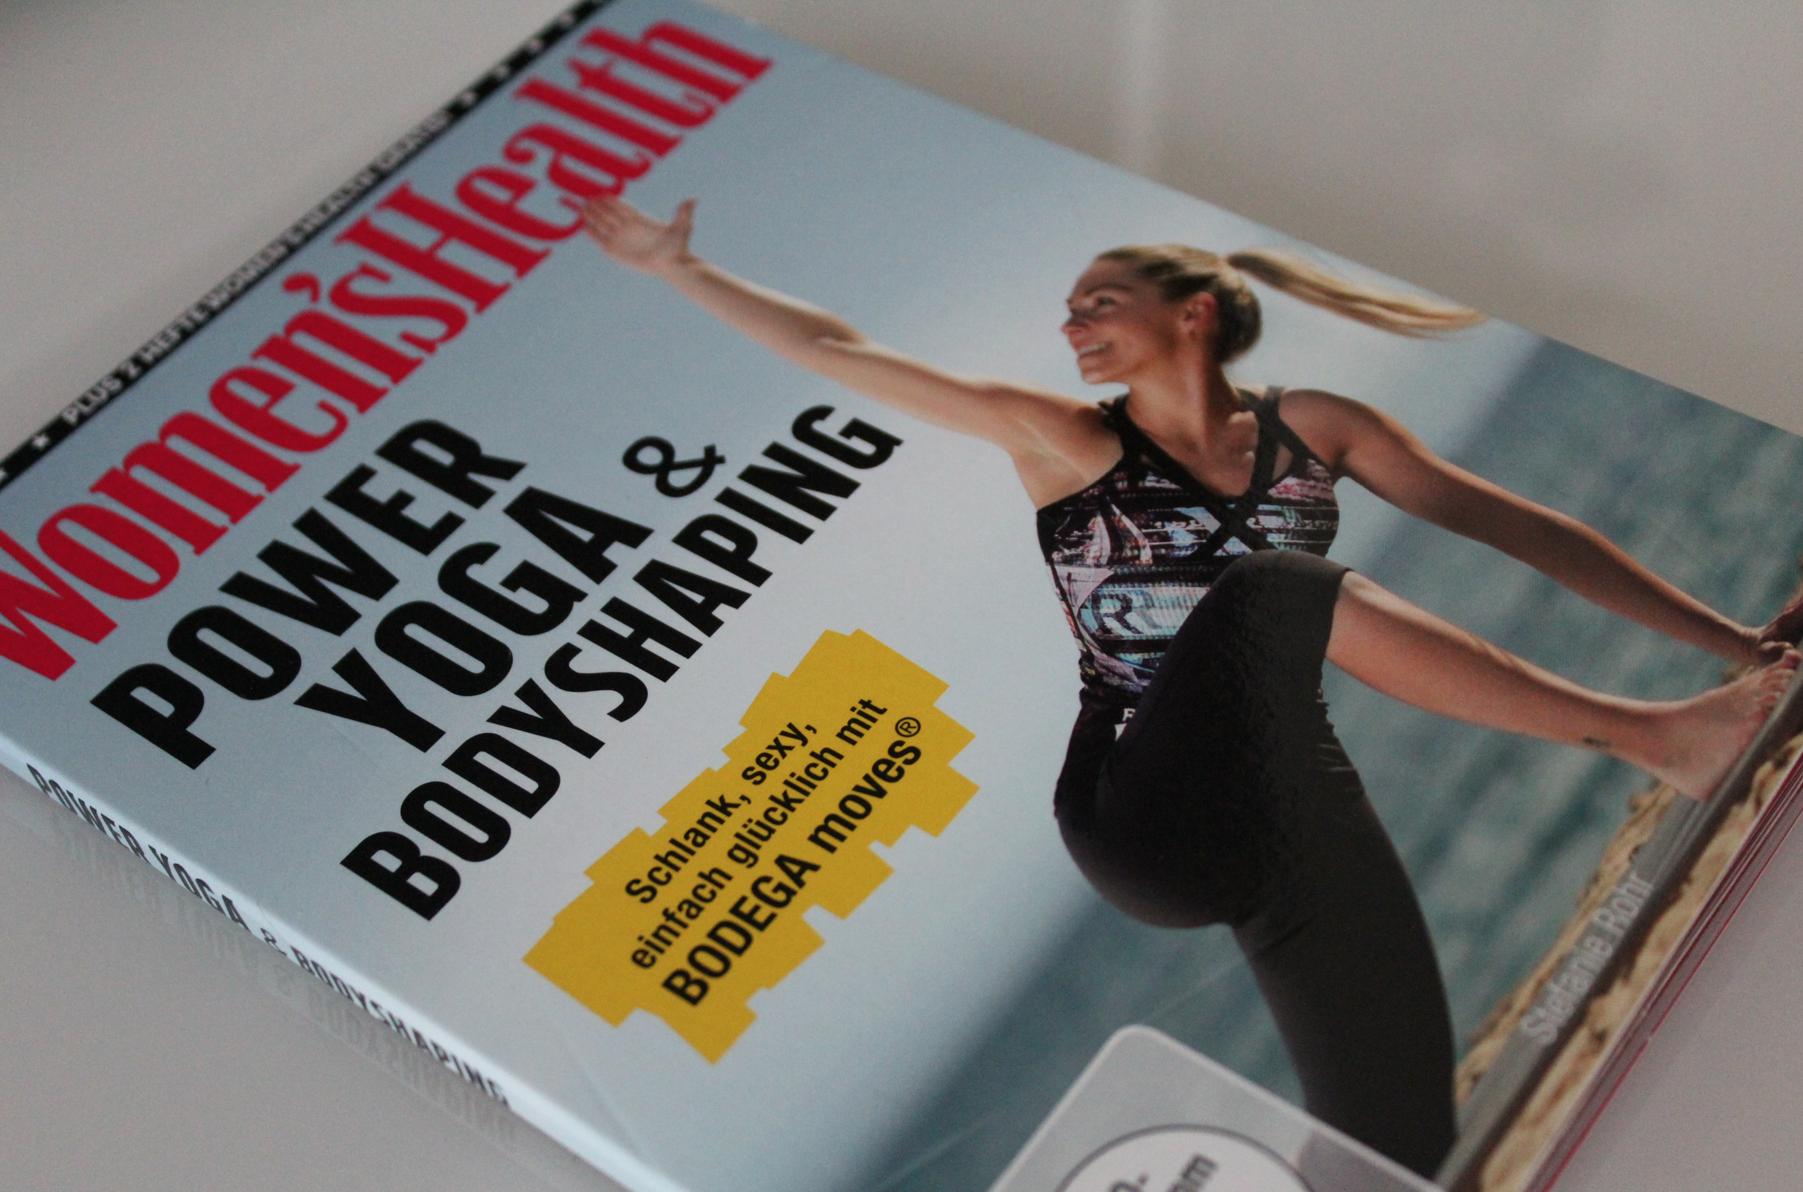 16 Power Yoga & Bodyshaping Womens Health Fitness Dvd